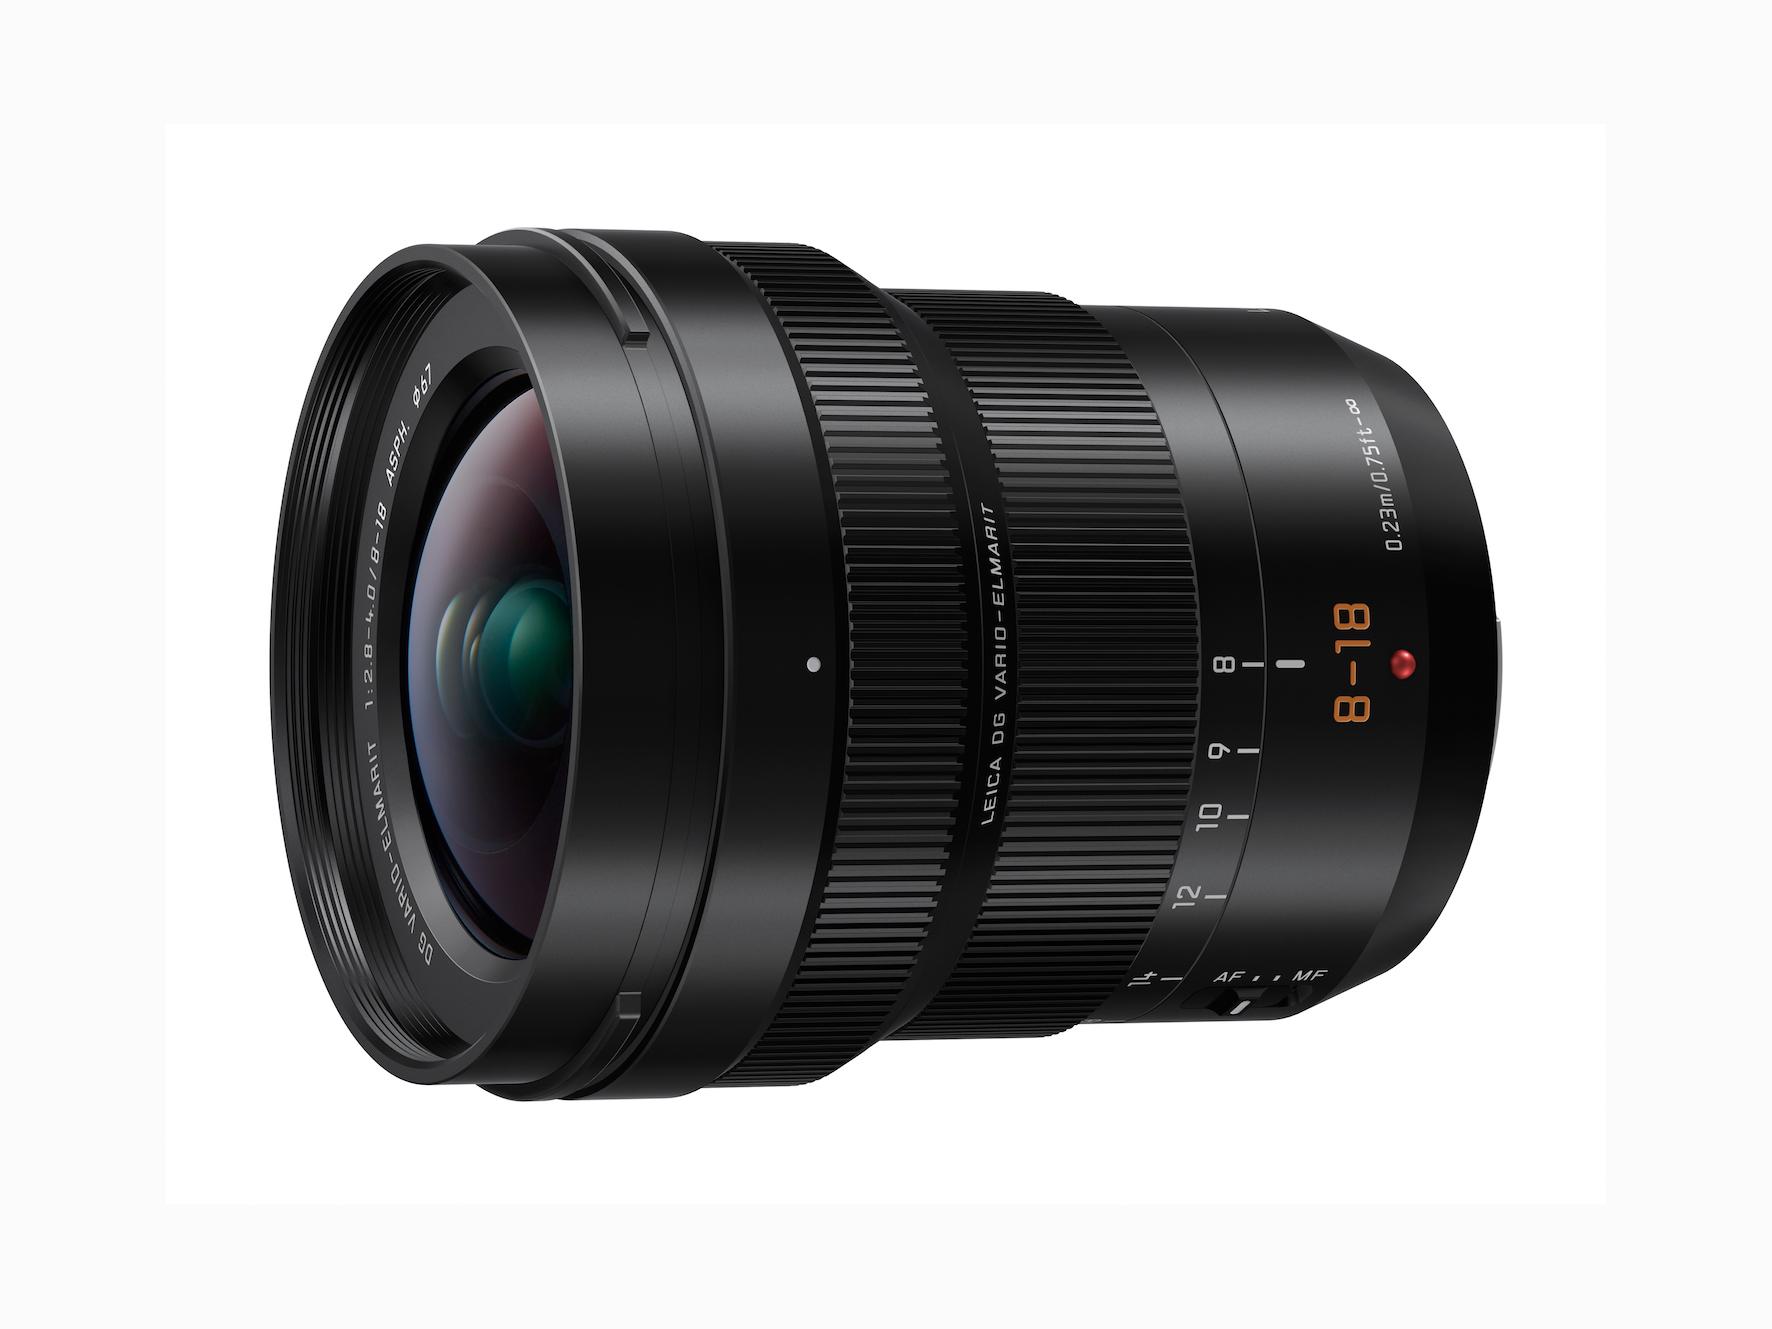 Leica DG Vario-Elmarit 8-18mm/F2,8-4,0 ASPH (16-36mm KB)